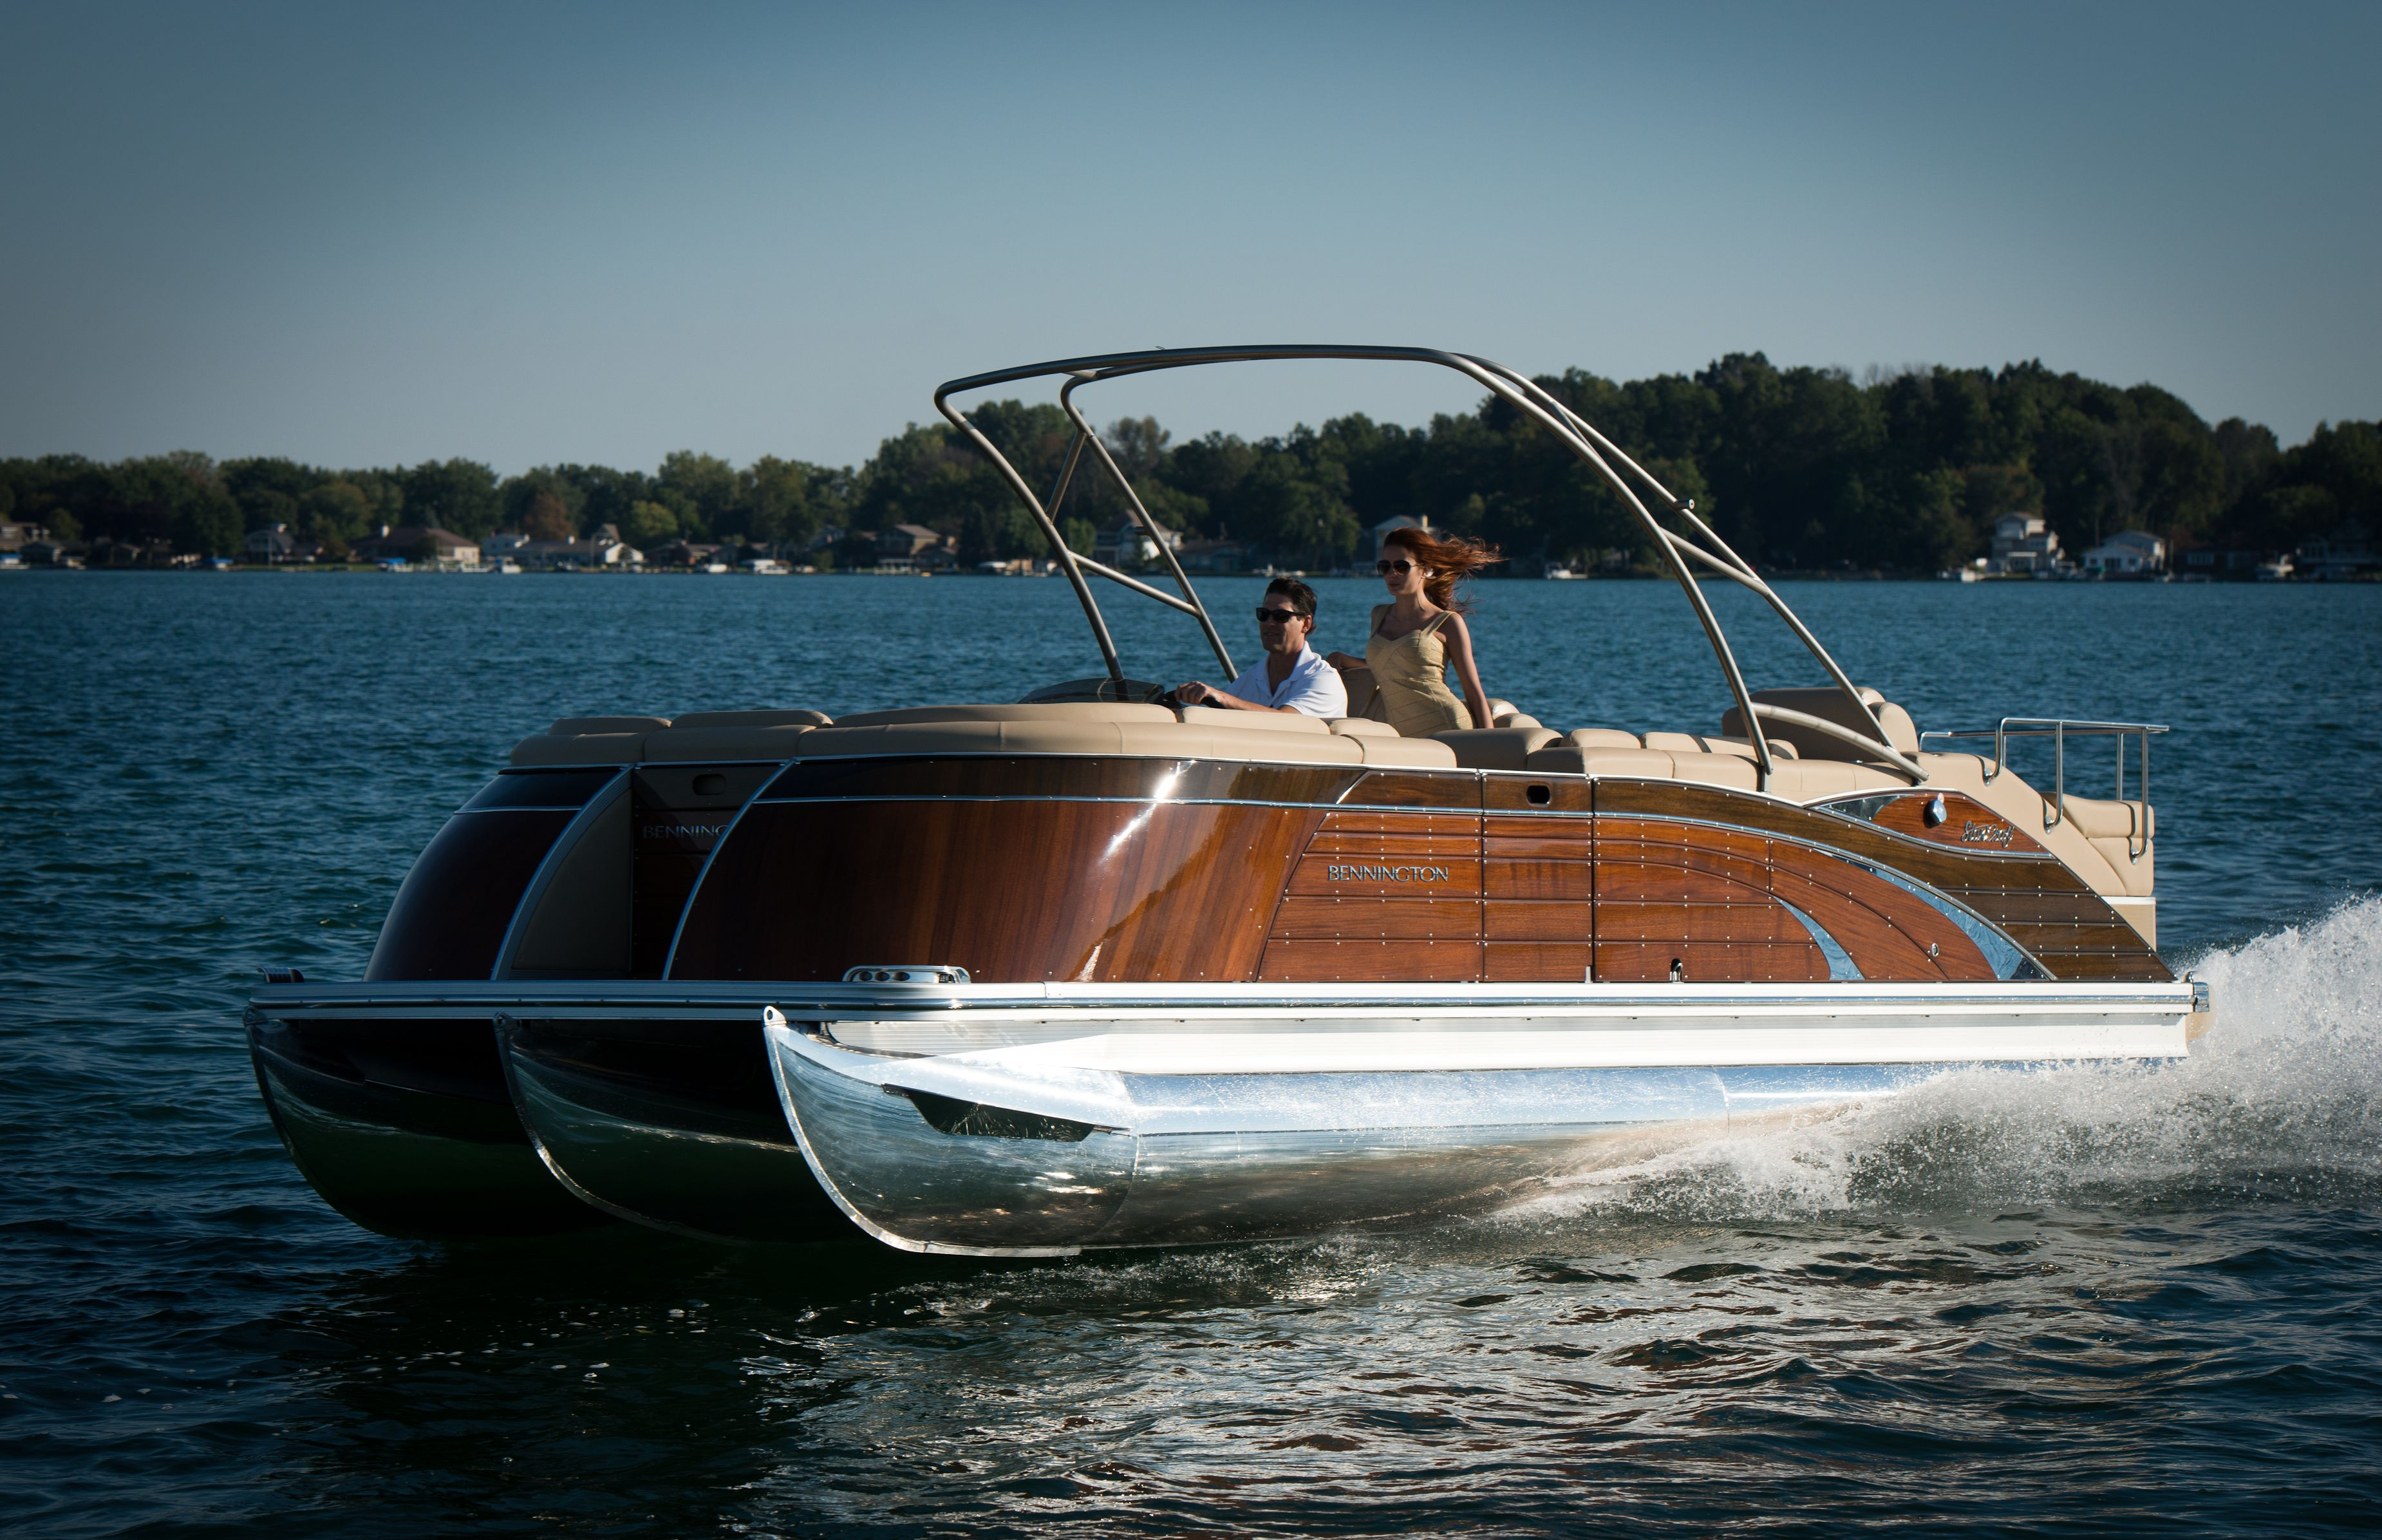 Bennington 2575qcw Mahogany Edition This Luxury Pontoon Boat Will